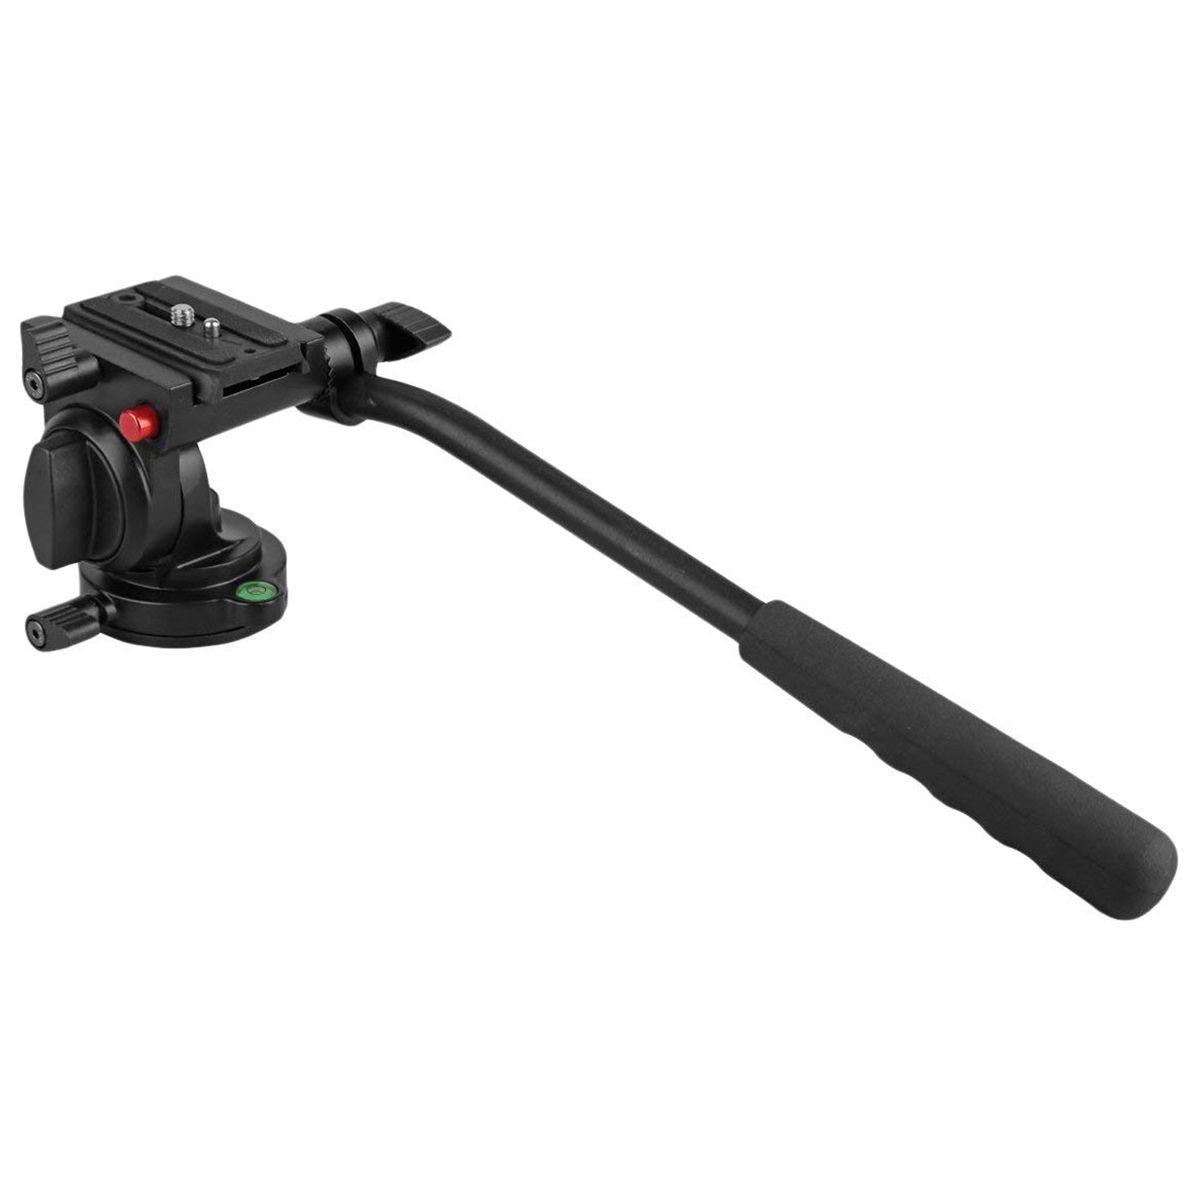 KINGJOY KH 6750 Flexible Aluminum Camera Tripod Head Fluid Video Tripod Head for Canon, Nikon and Other DSLR Cameras with 1/4